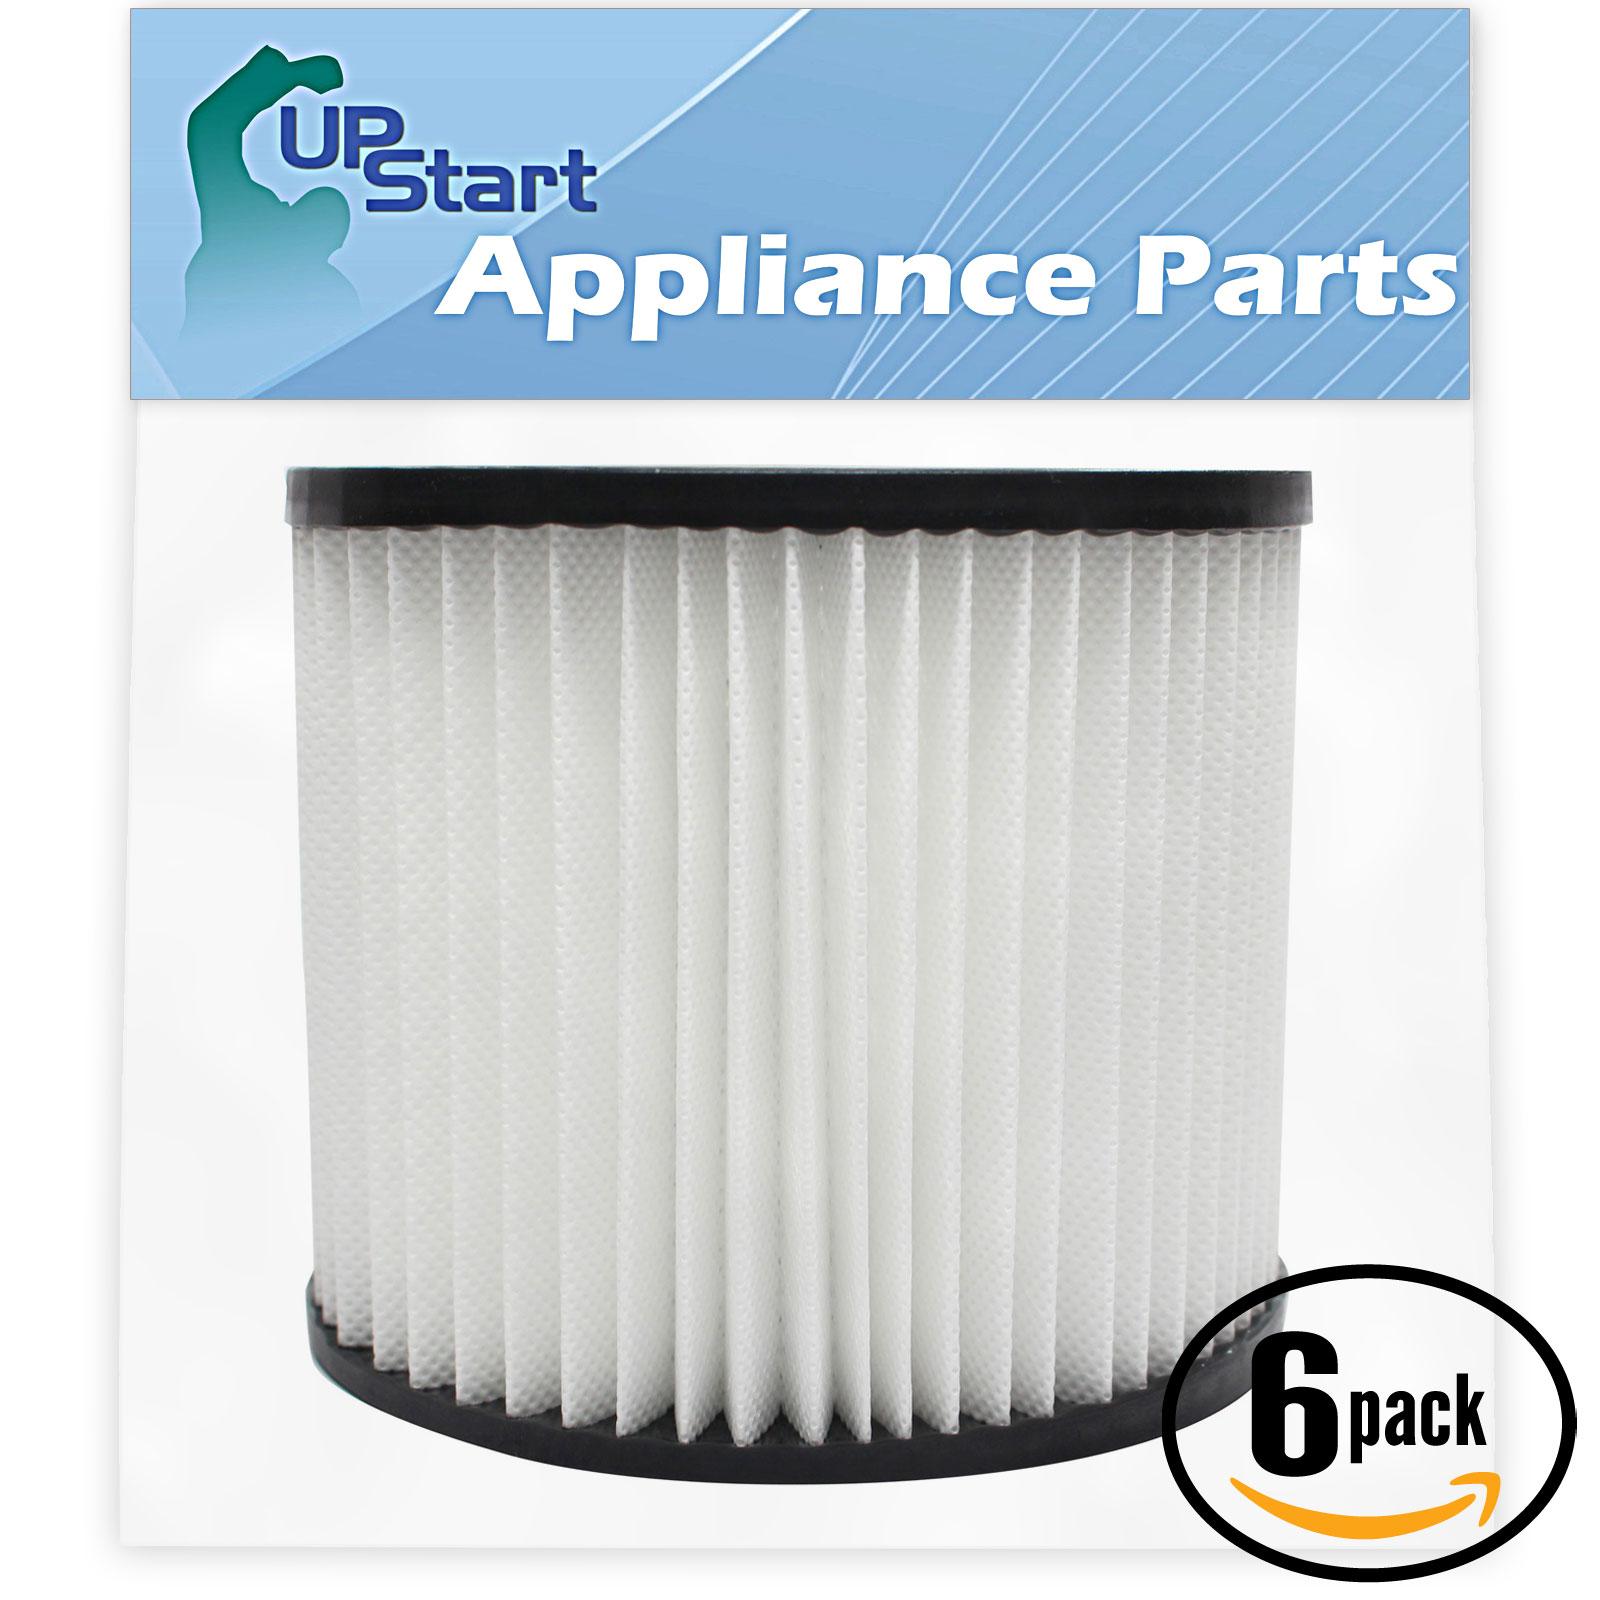 UpStart 6-Pack Replacement Shop-Vac Back Pack 286-00-10 V...